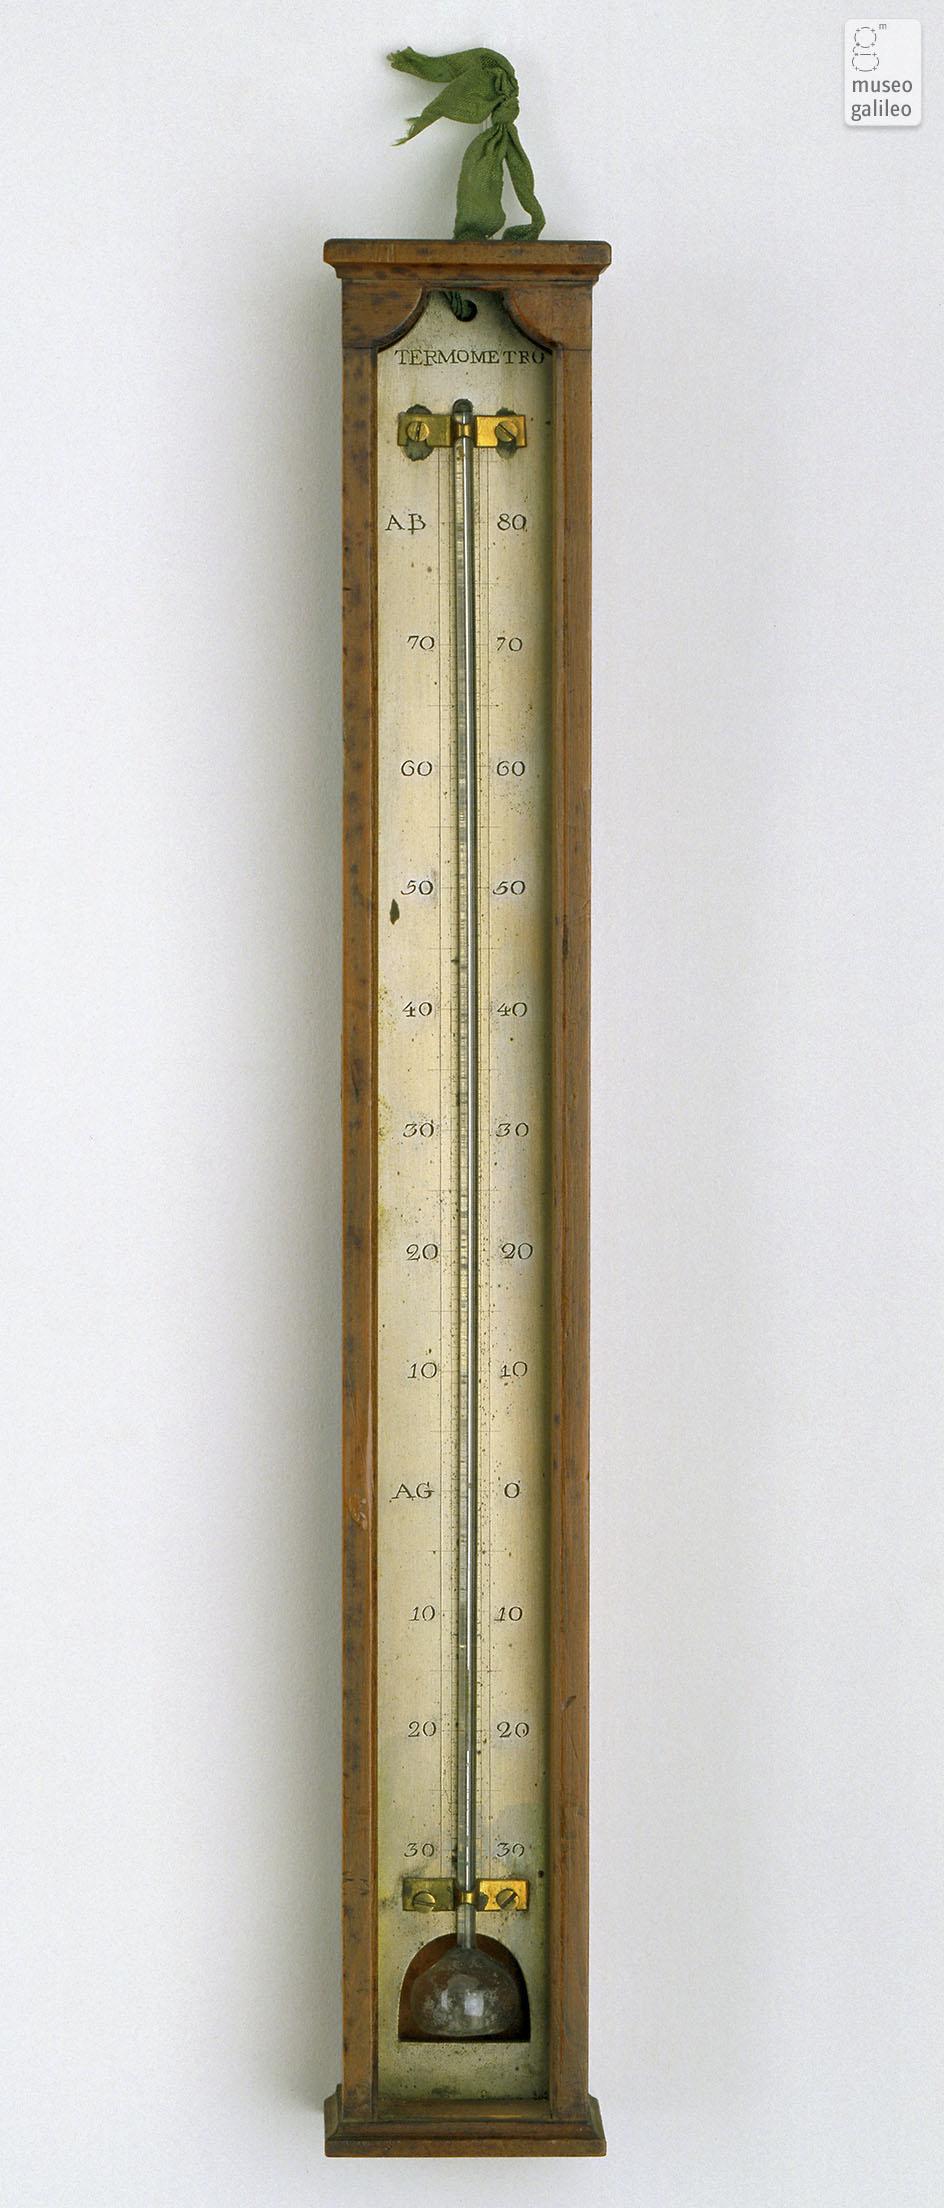 museo galileo   ingrandimento foto   termometro a mercurio